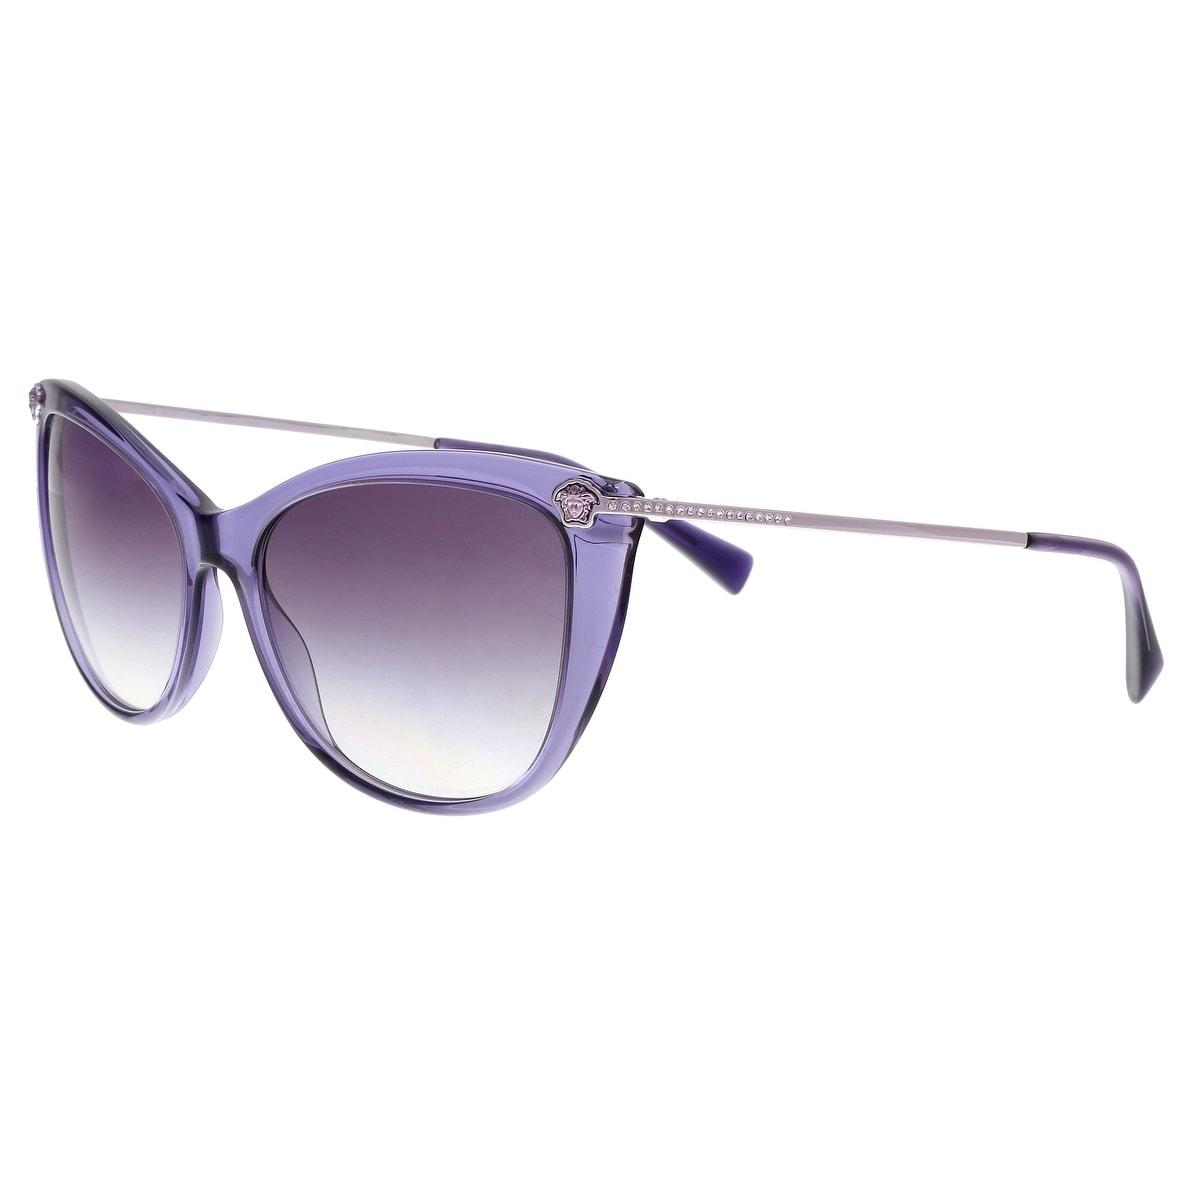 90a467e79653 Plastic Versace Sunglasses